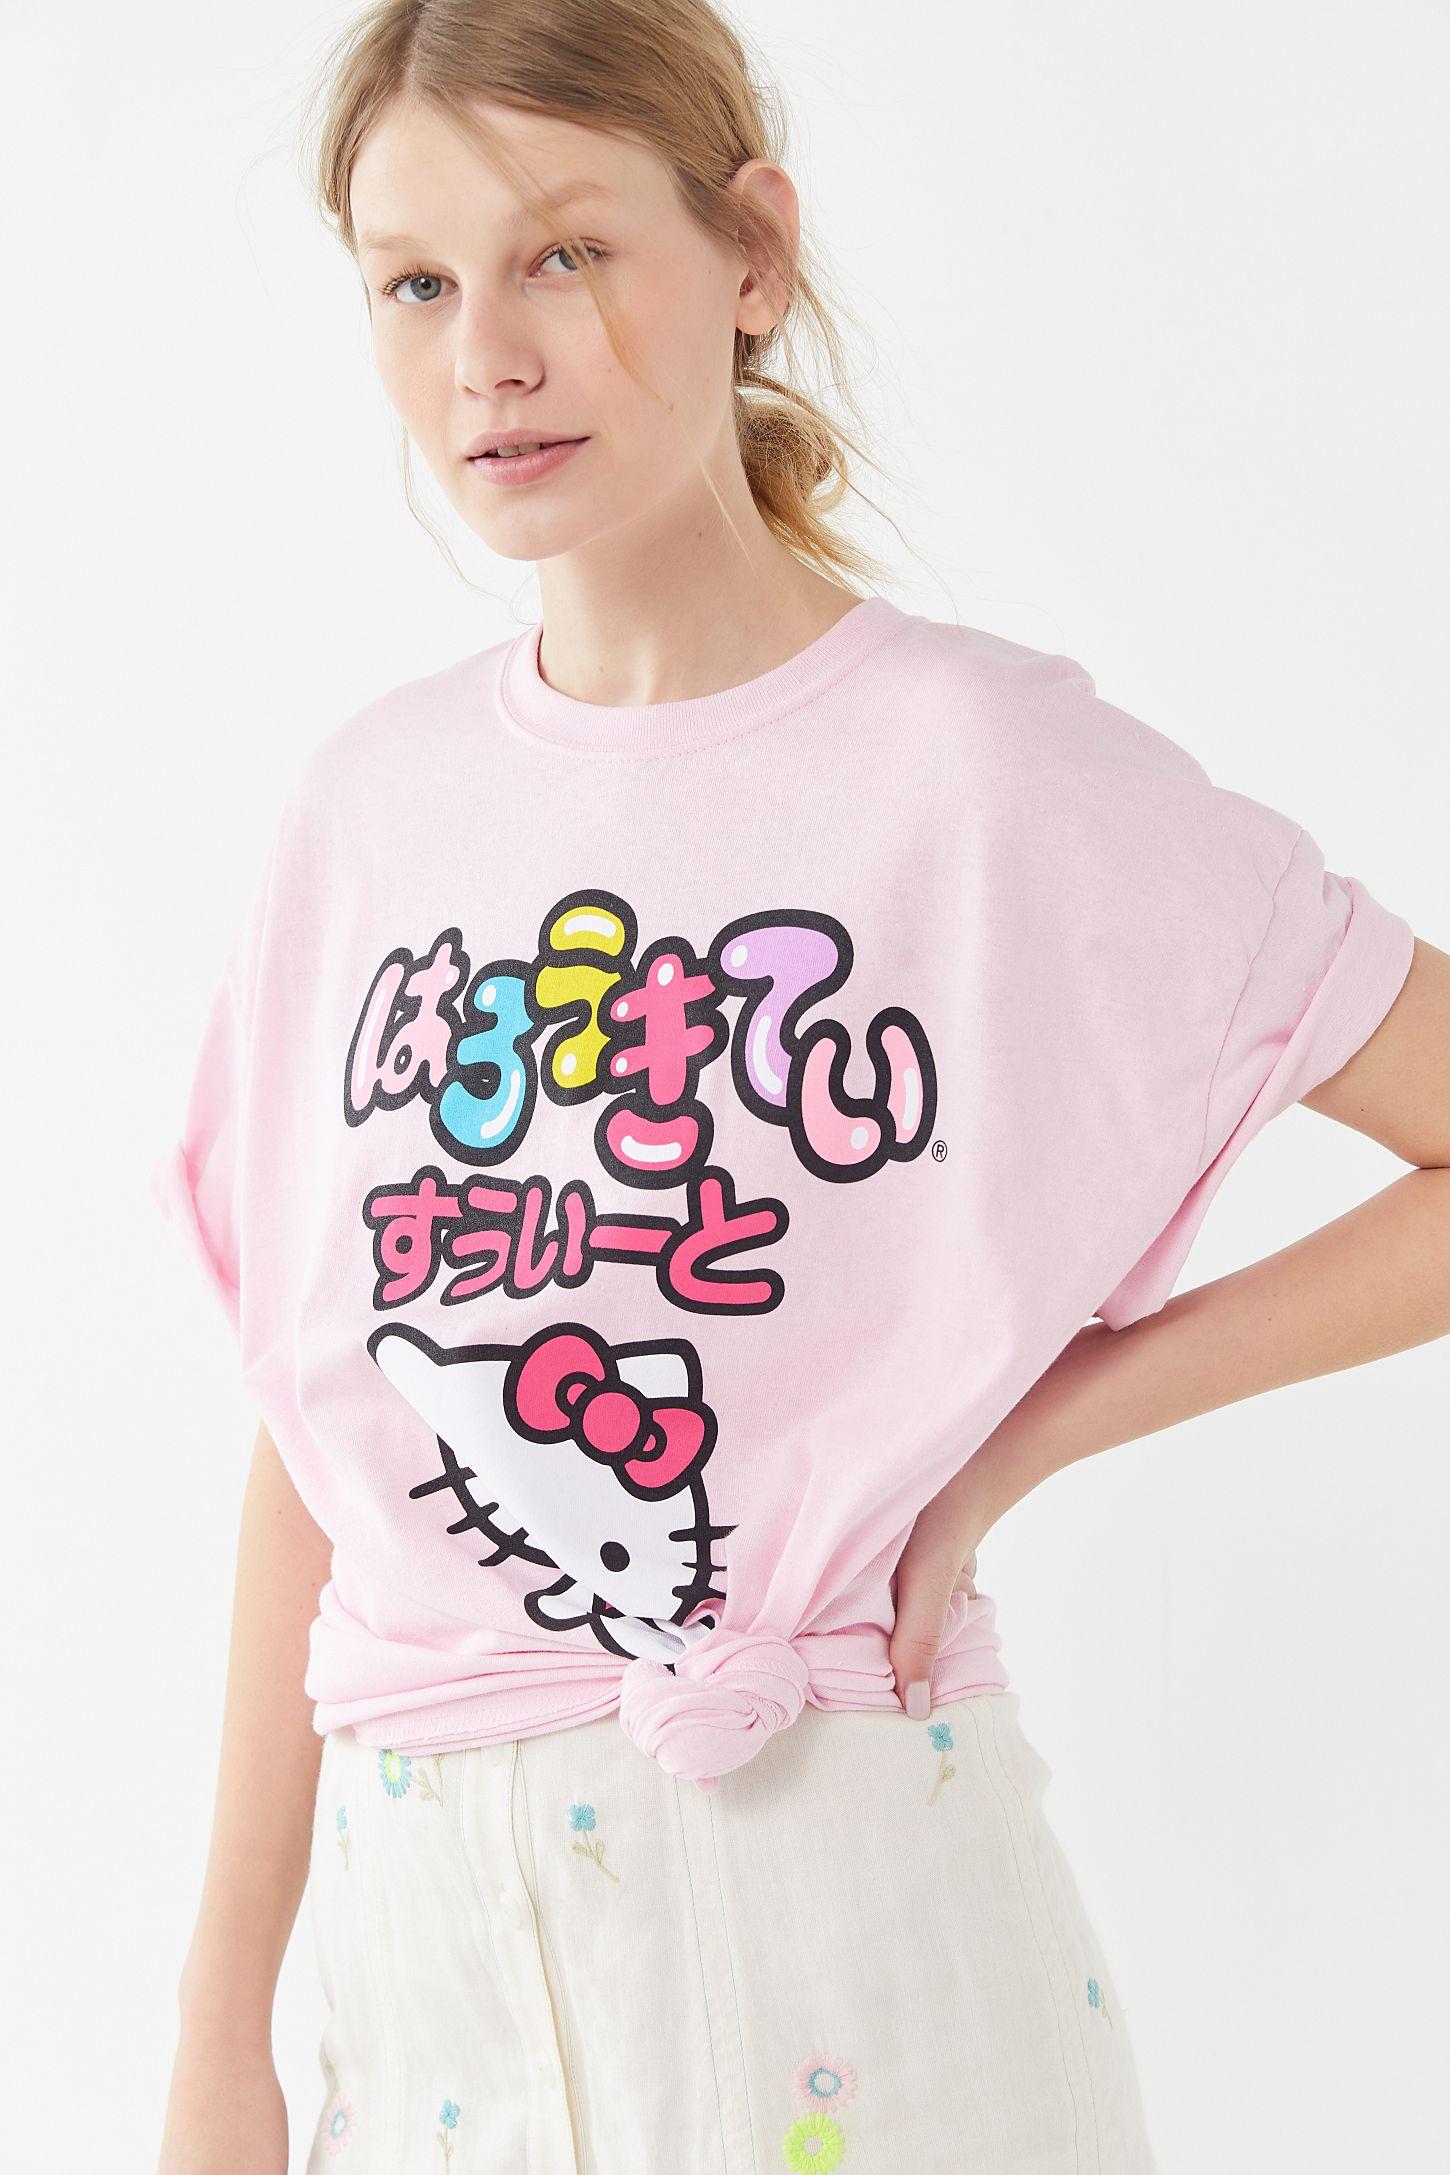 dfcfdb120 Girl Skateboard Hello Kitty T Shirt - Nils Stucki Kieferorthopäde